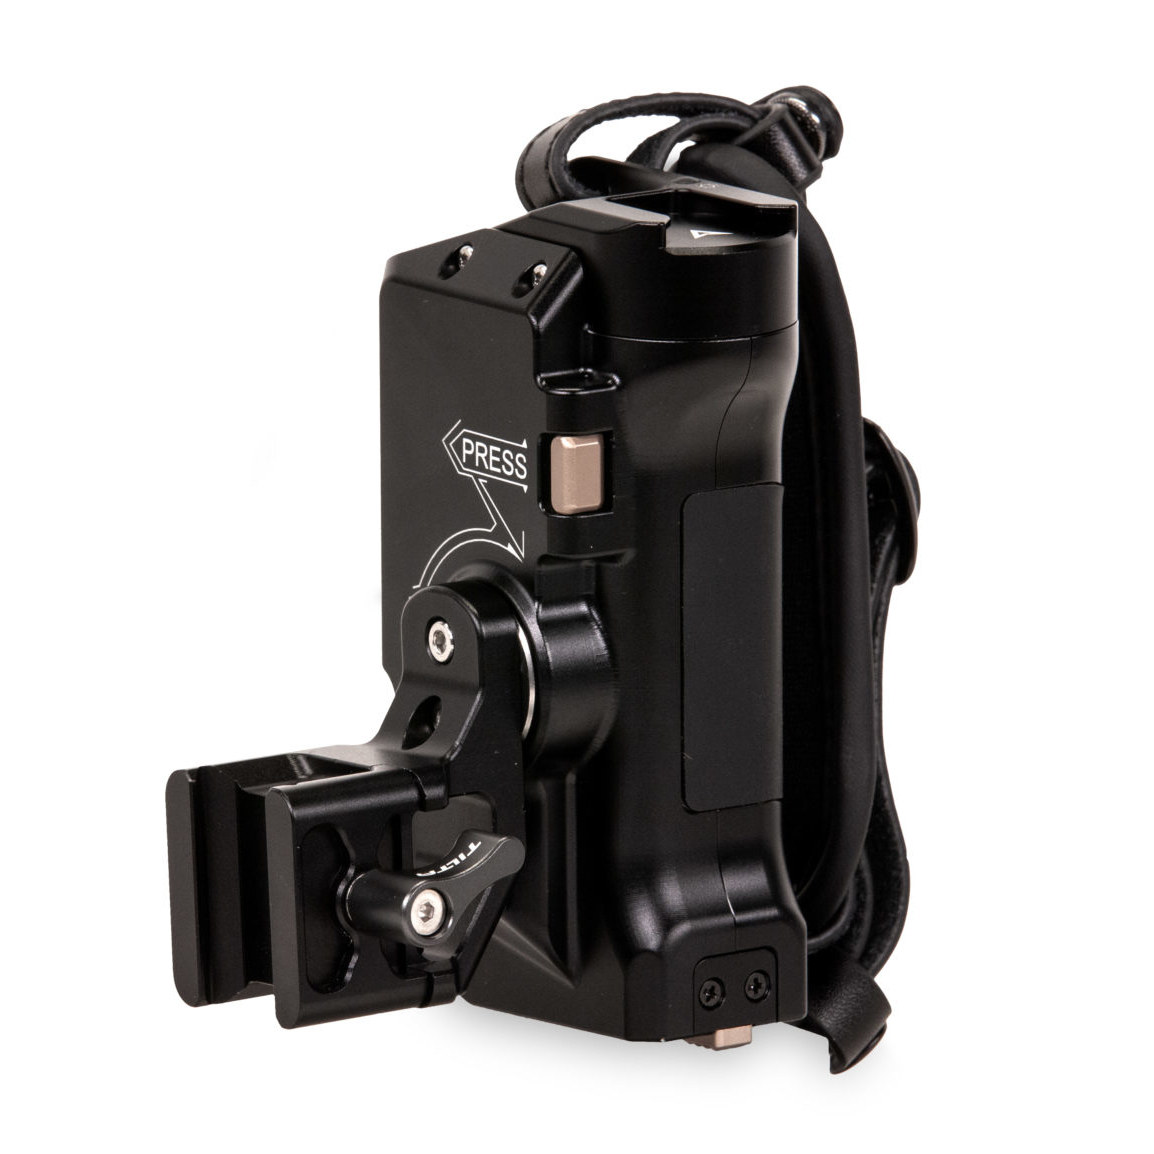 tilta-TA-LRH6-57-B-left-side-advanced-run-stop-handle-r%C4%85czka-steruj%C4%85ca-01.jpg